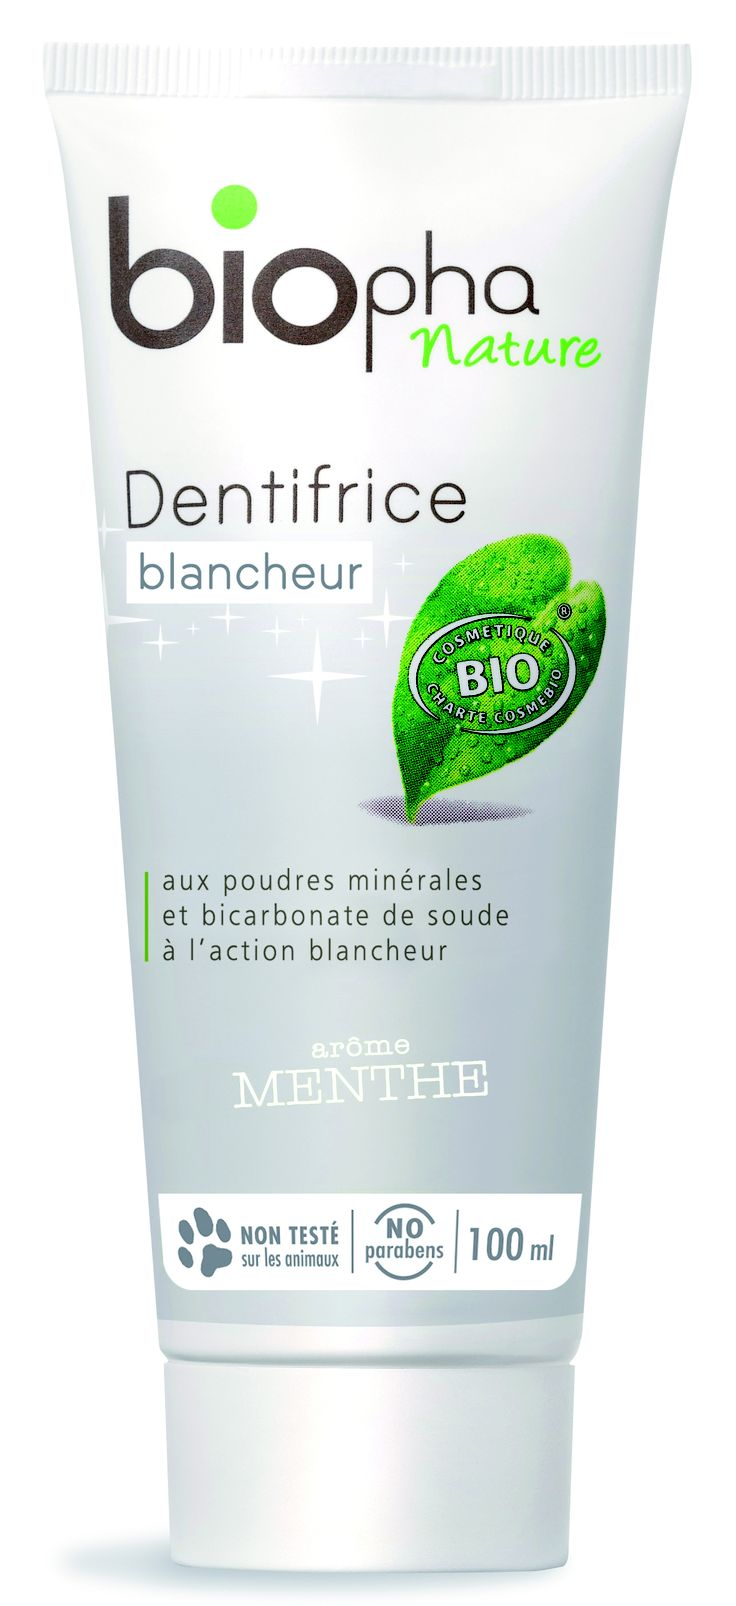 Dentifrice blancheur à la menthe, Biopha: Beautiful Wishlist, Mint, Dentifrice Blancheur, Lamand Blanche